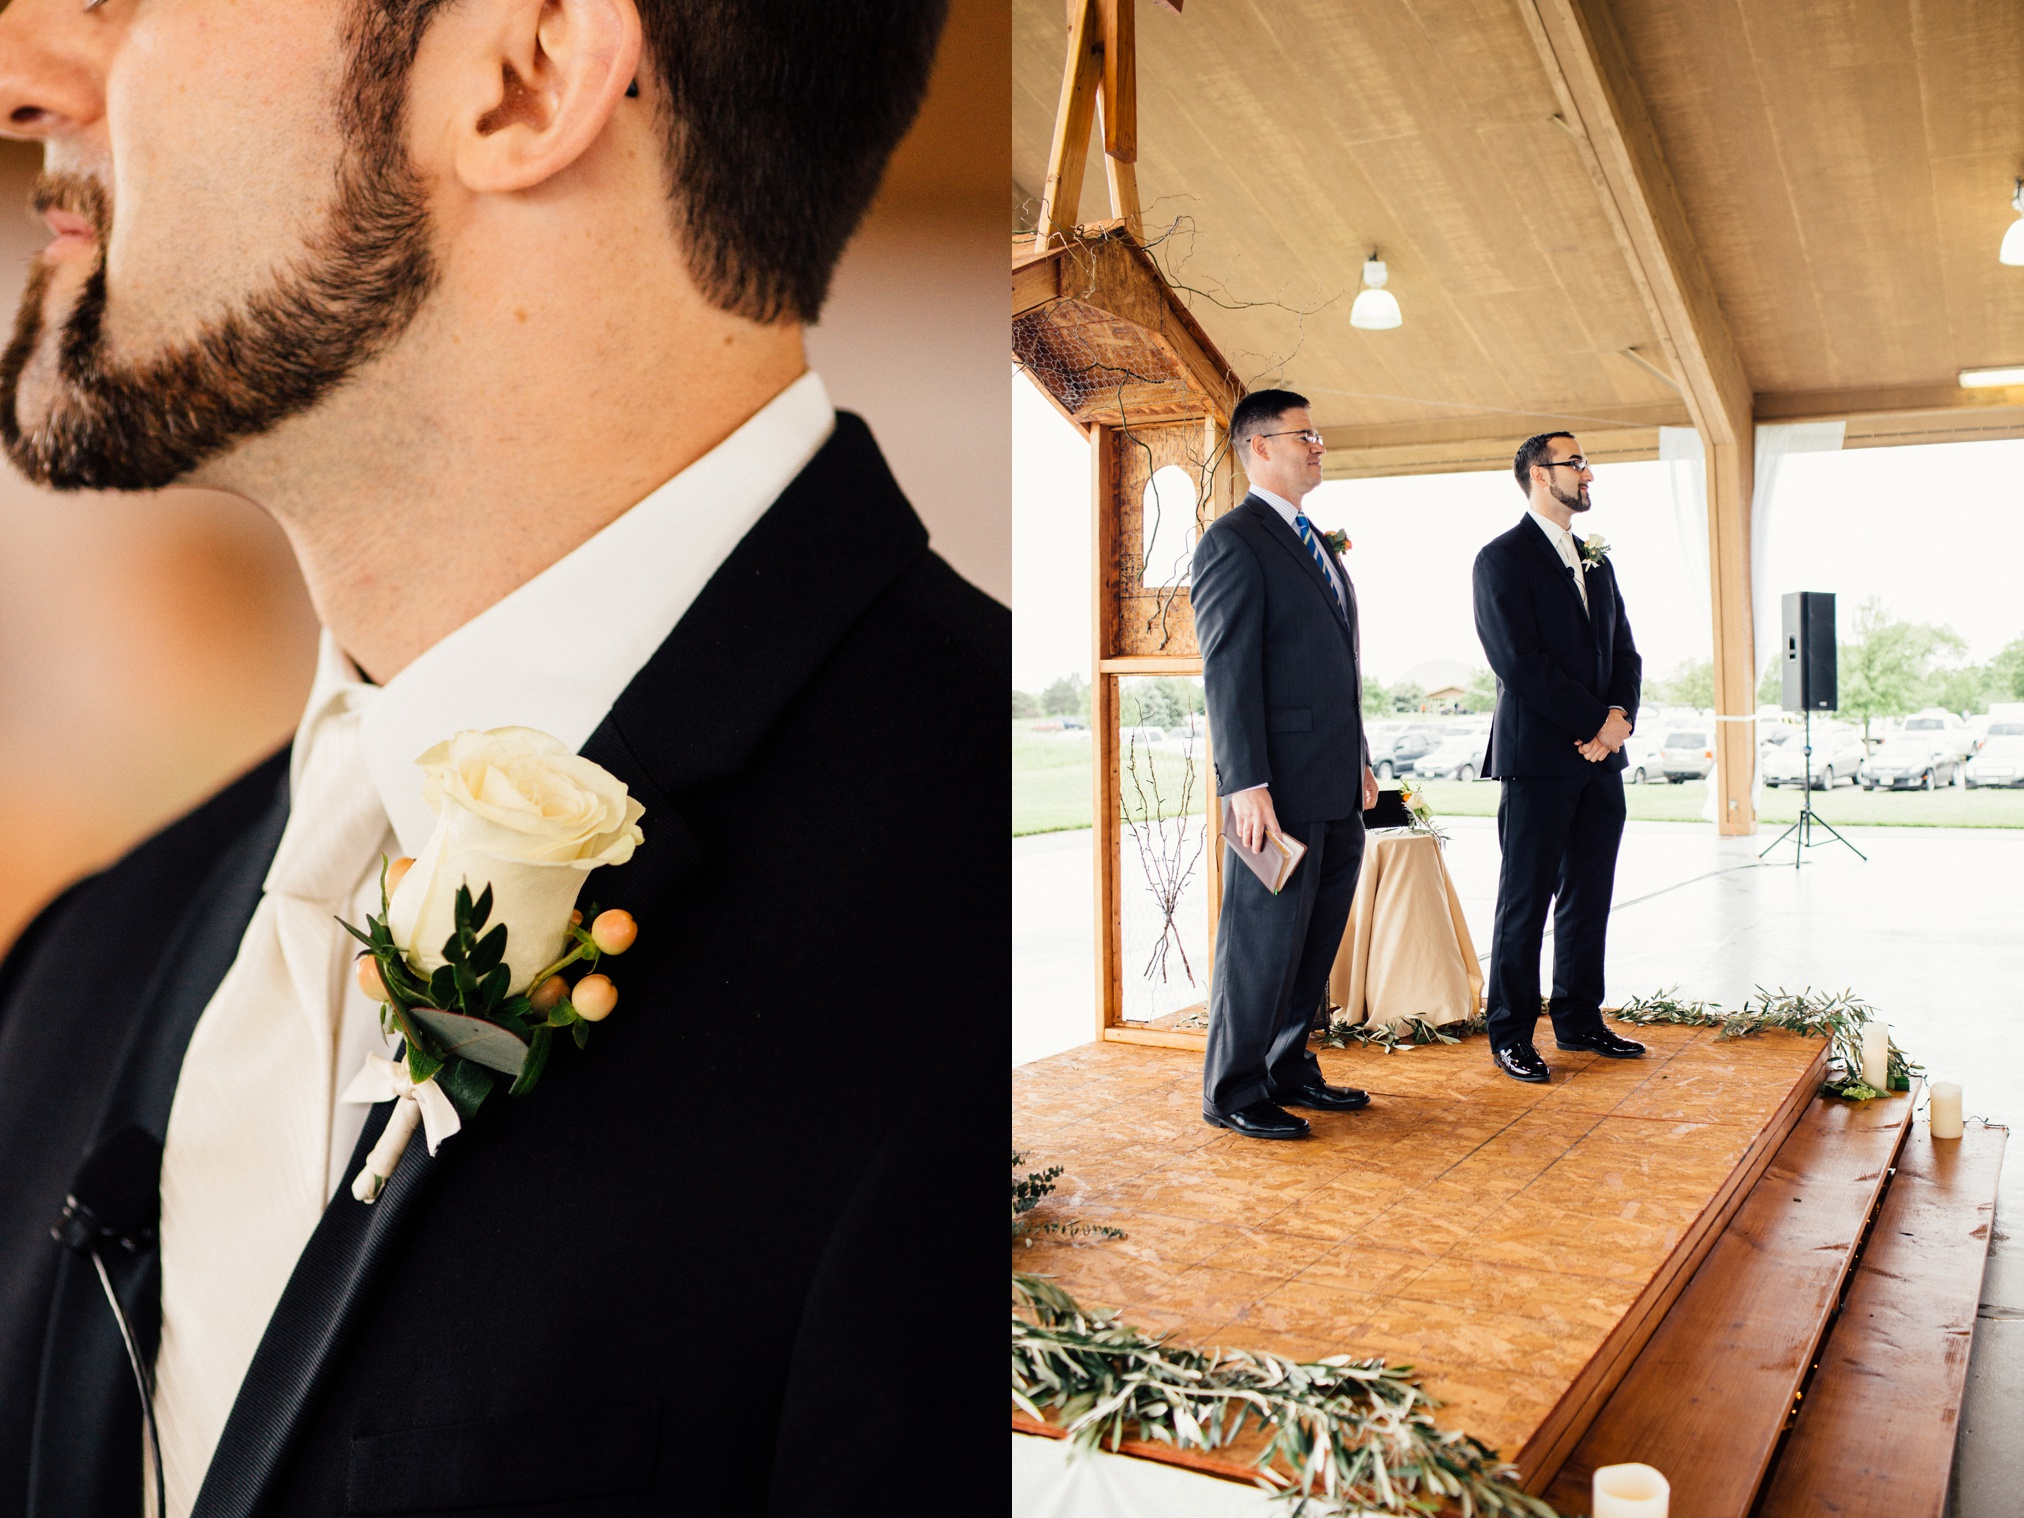 schmid_wedding-318.jpg